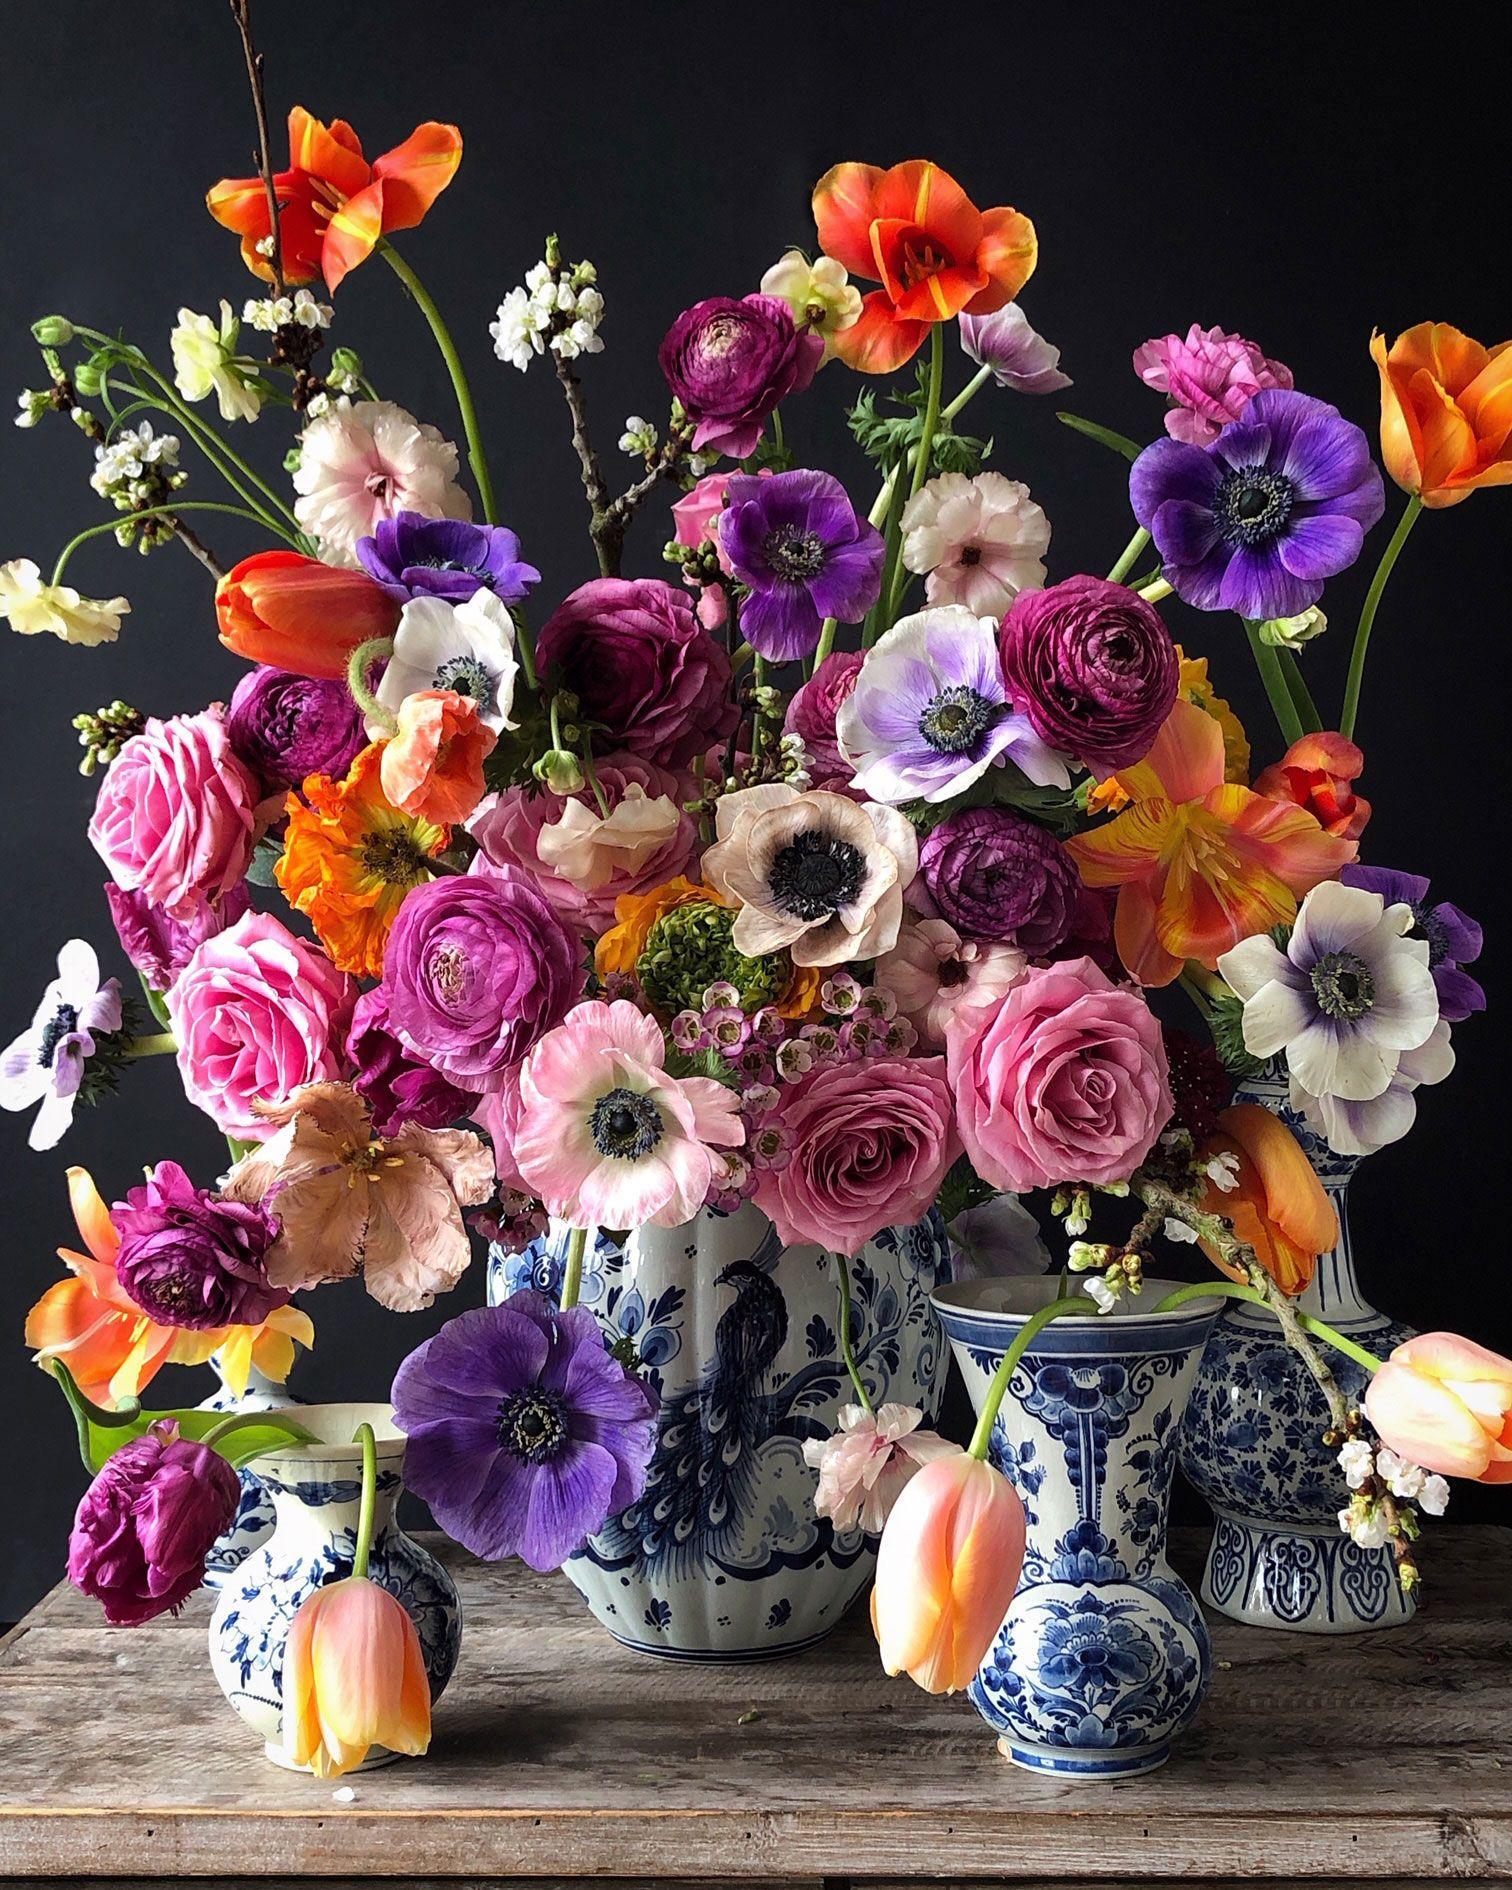 Fashion Designer and Baker Natasja Sadi's Feast of Flowers